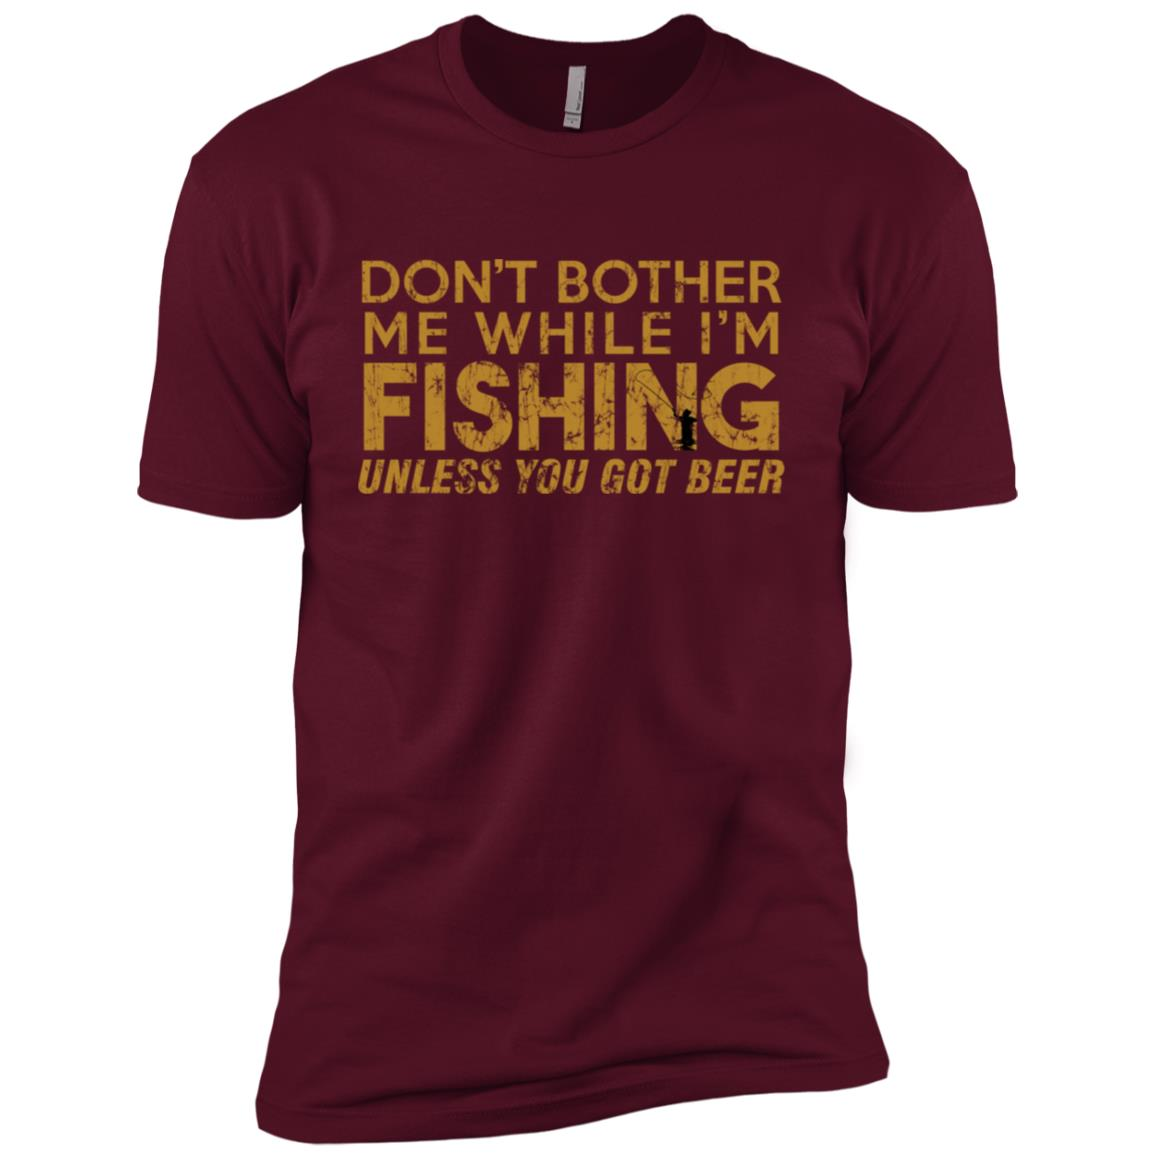 Fishing Funny Sarcasm Quotes Joke Hobbies Humor-2 Men Short Sleeve T-Shirt